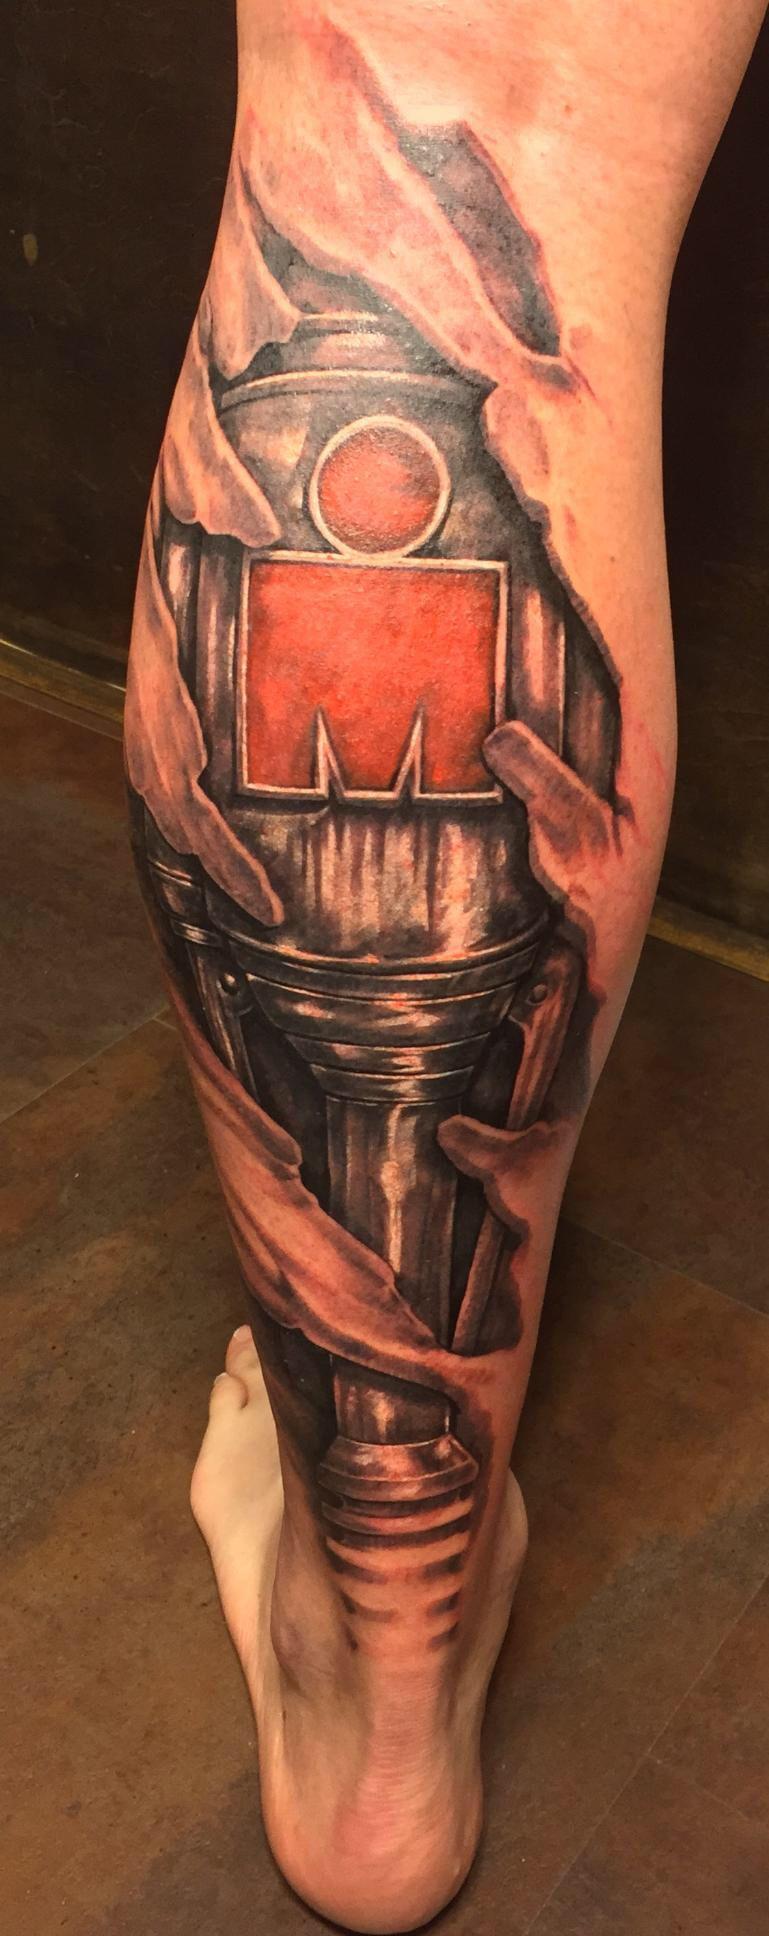 Ironman Mdot 3d Skin Rip Cyborg Biomechanical Tattoo Iron Man Tattoo Triathlon Tattoo Ironman Triathlon Tattoo